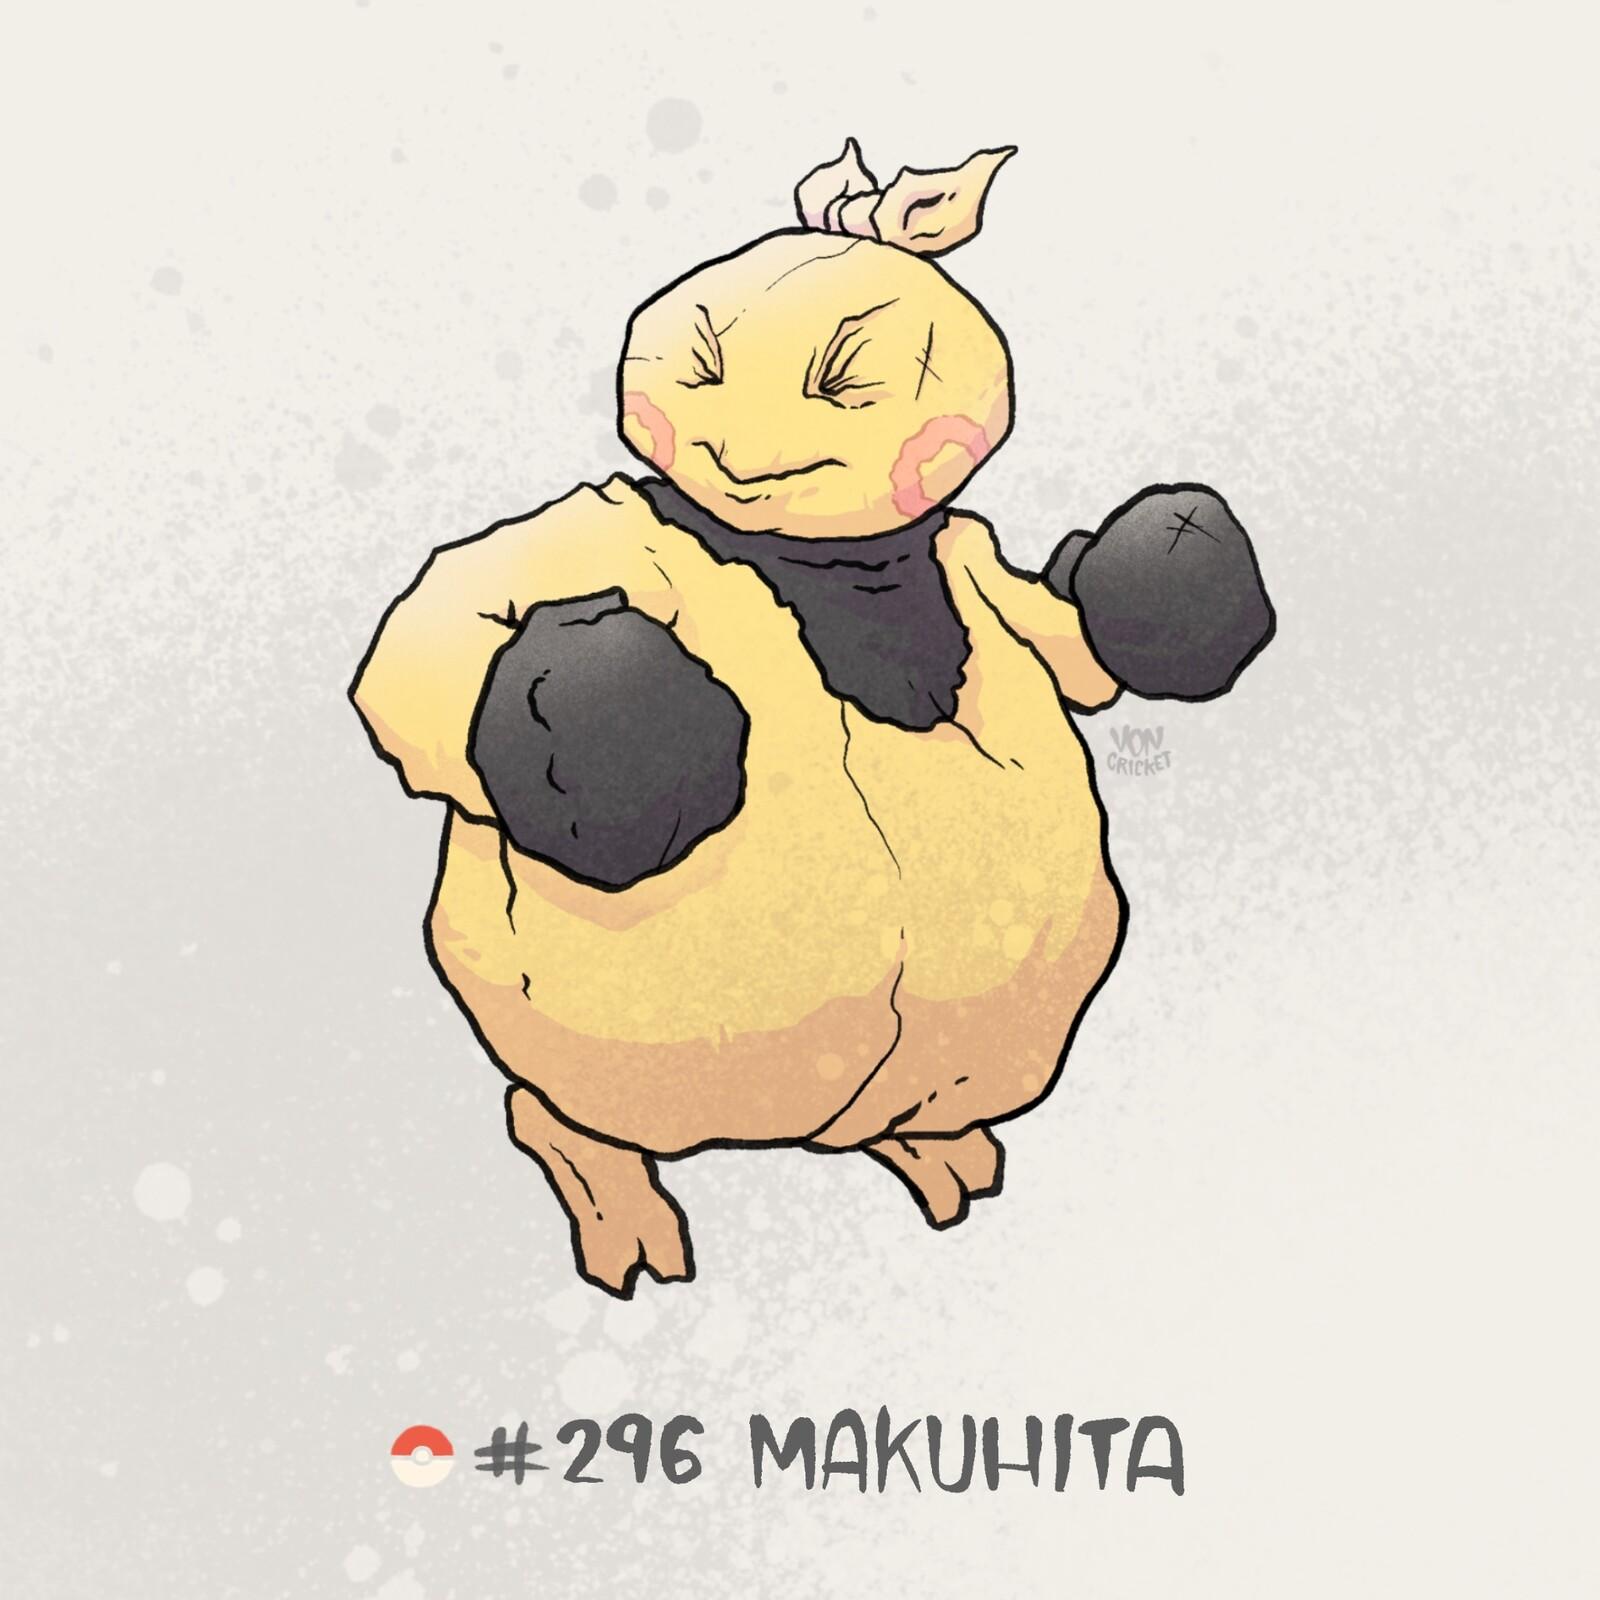 #296 Makuhita